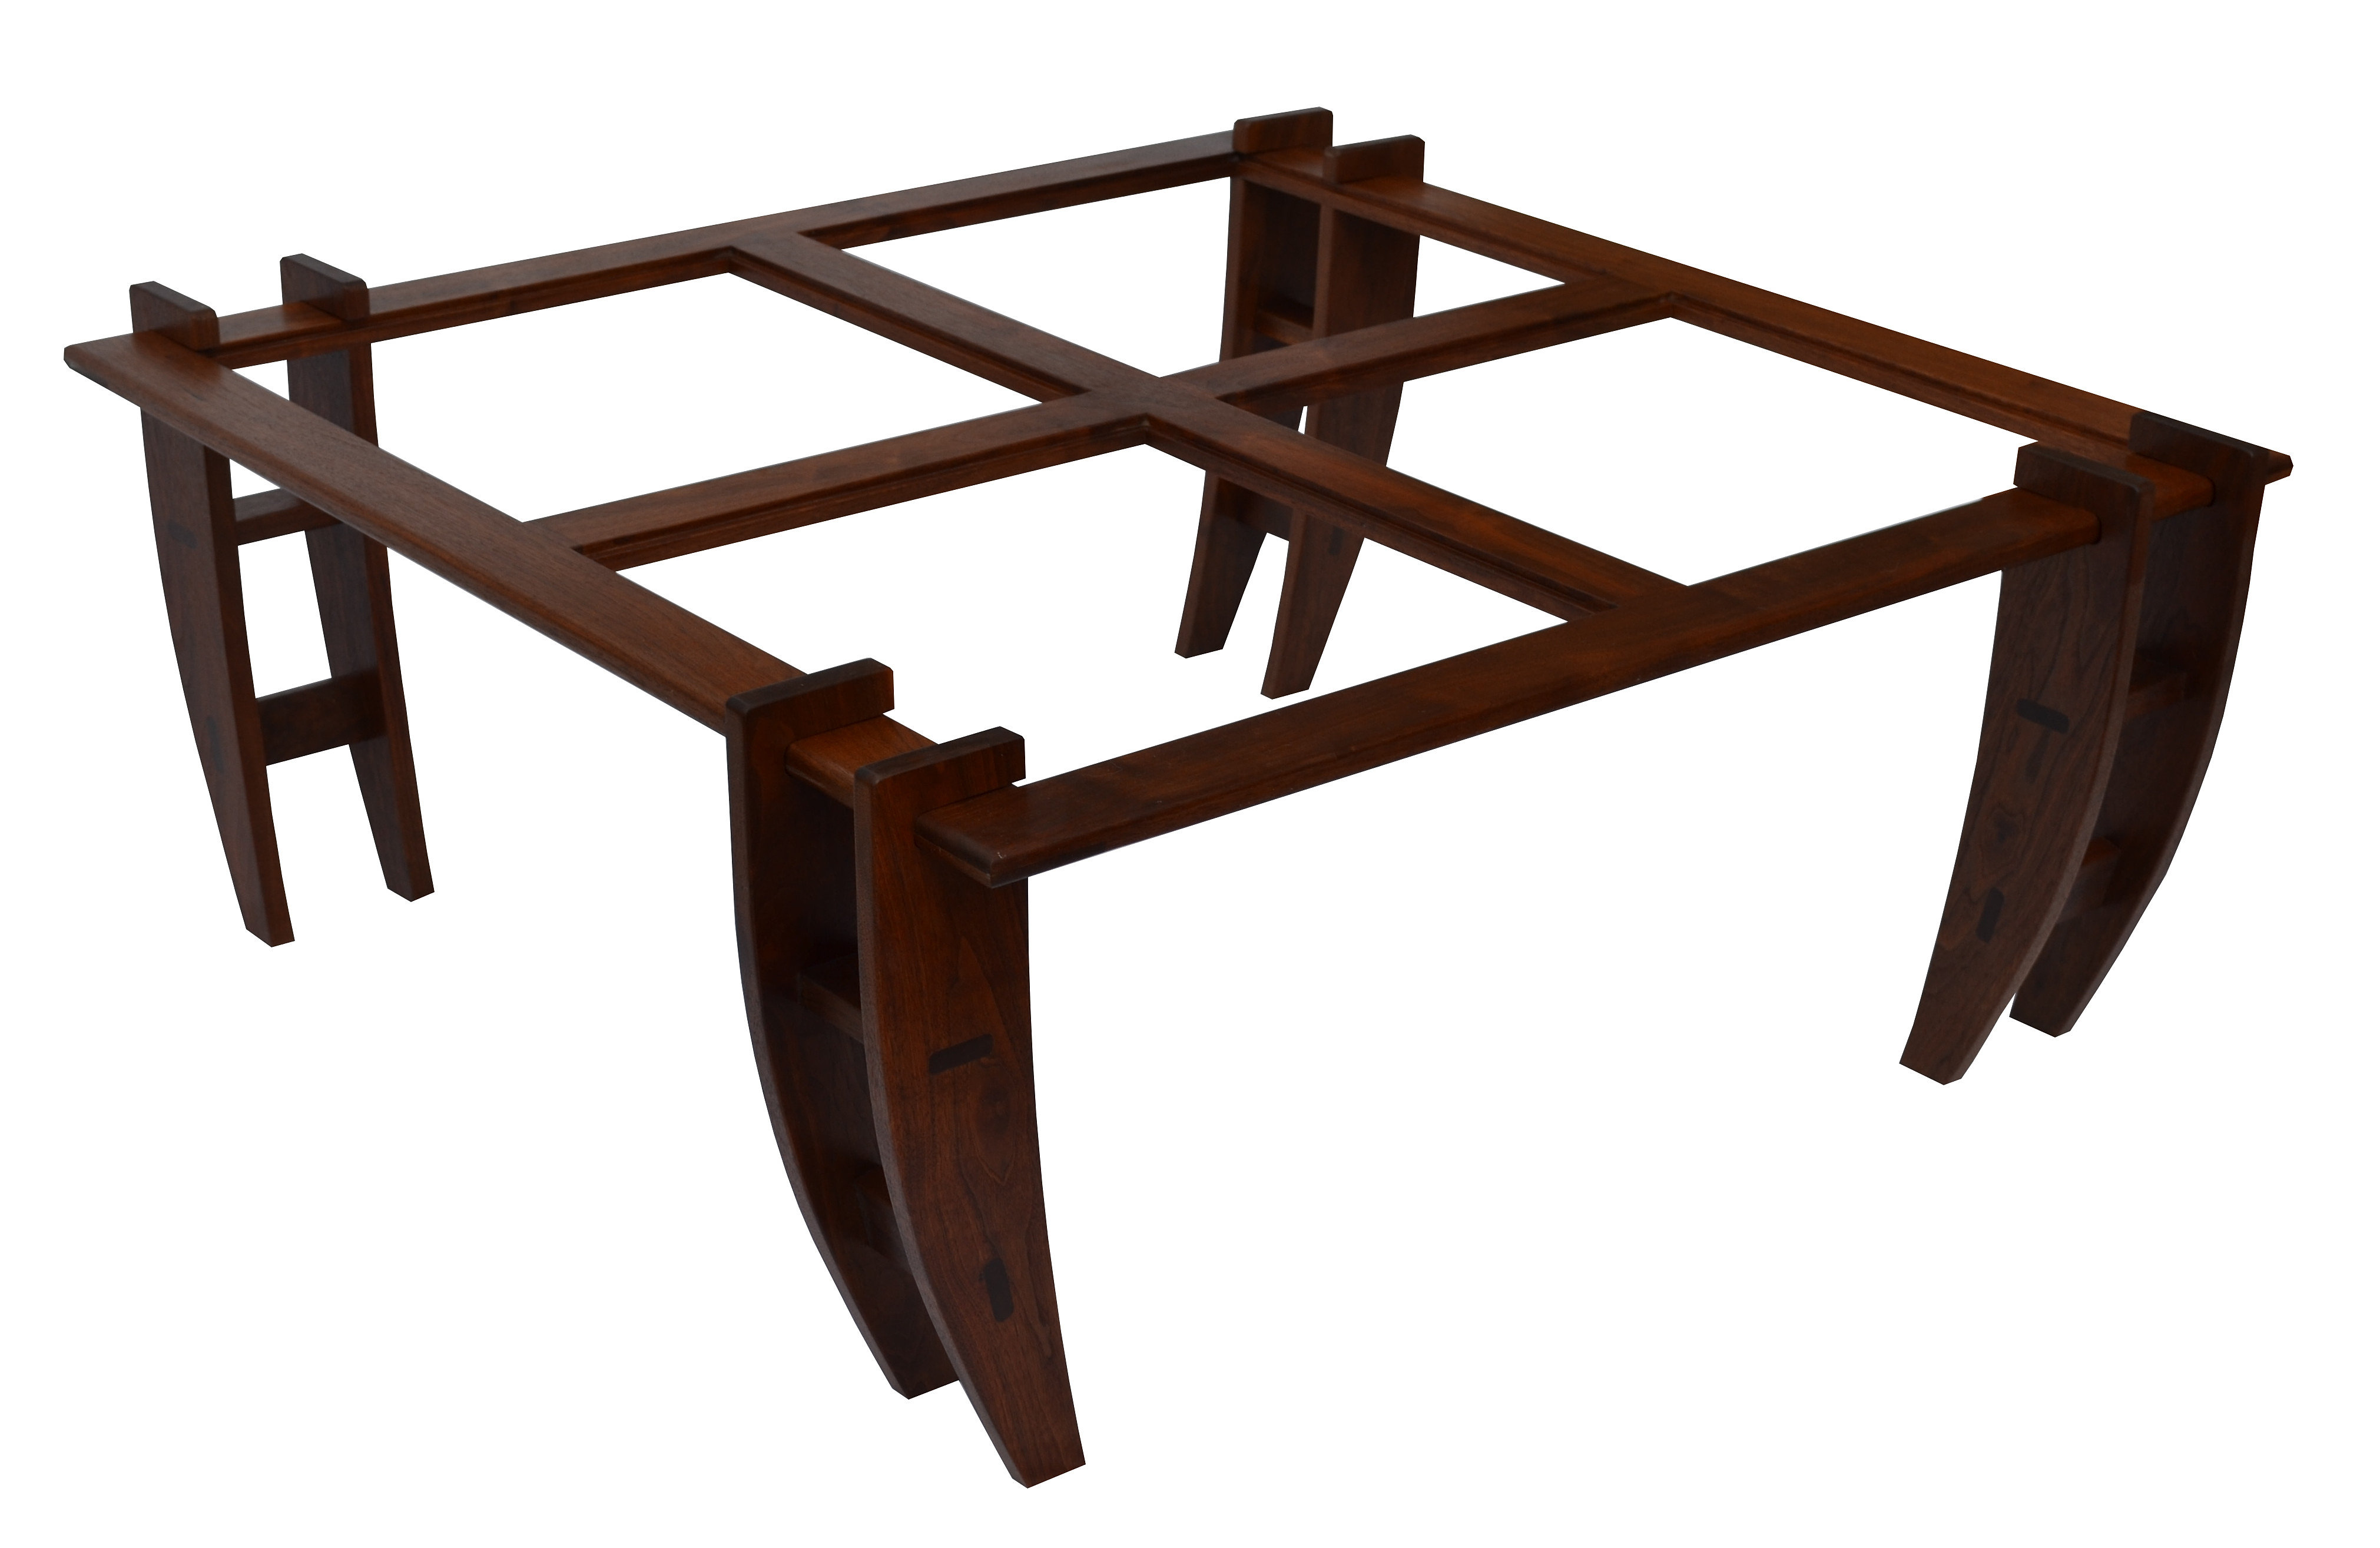 Kinloch Designs Custom Furniture Design And Build Denver Colorado Custom Furniture Design